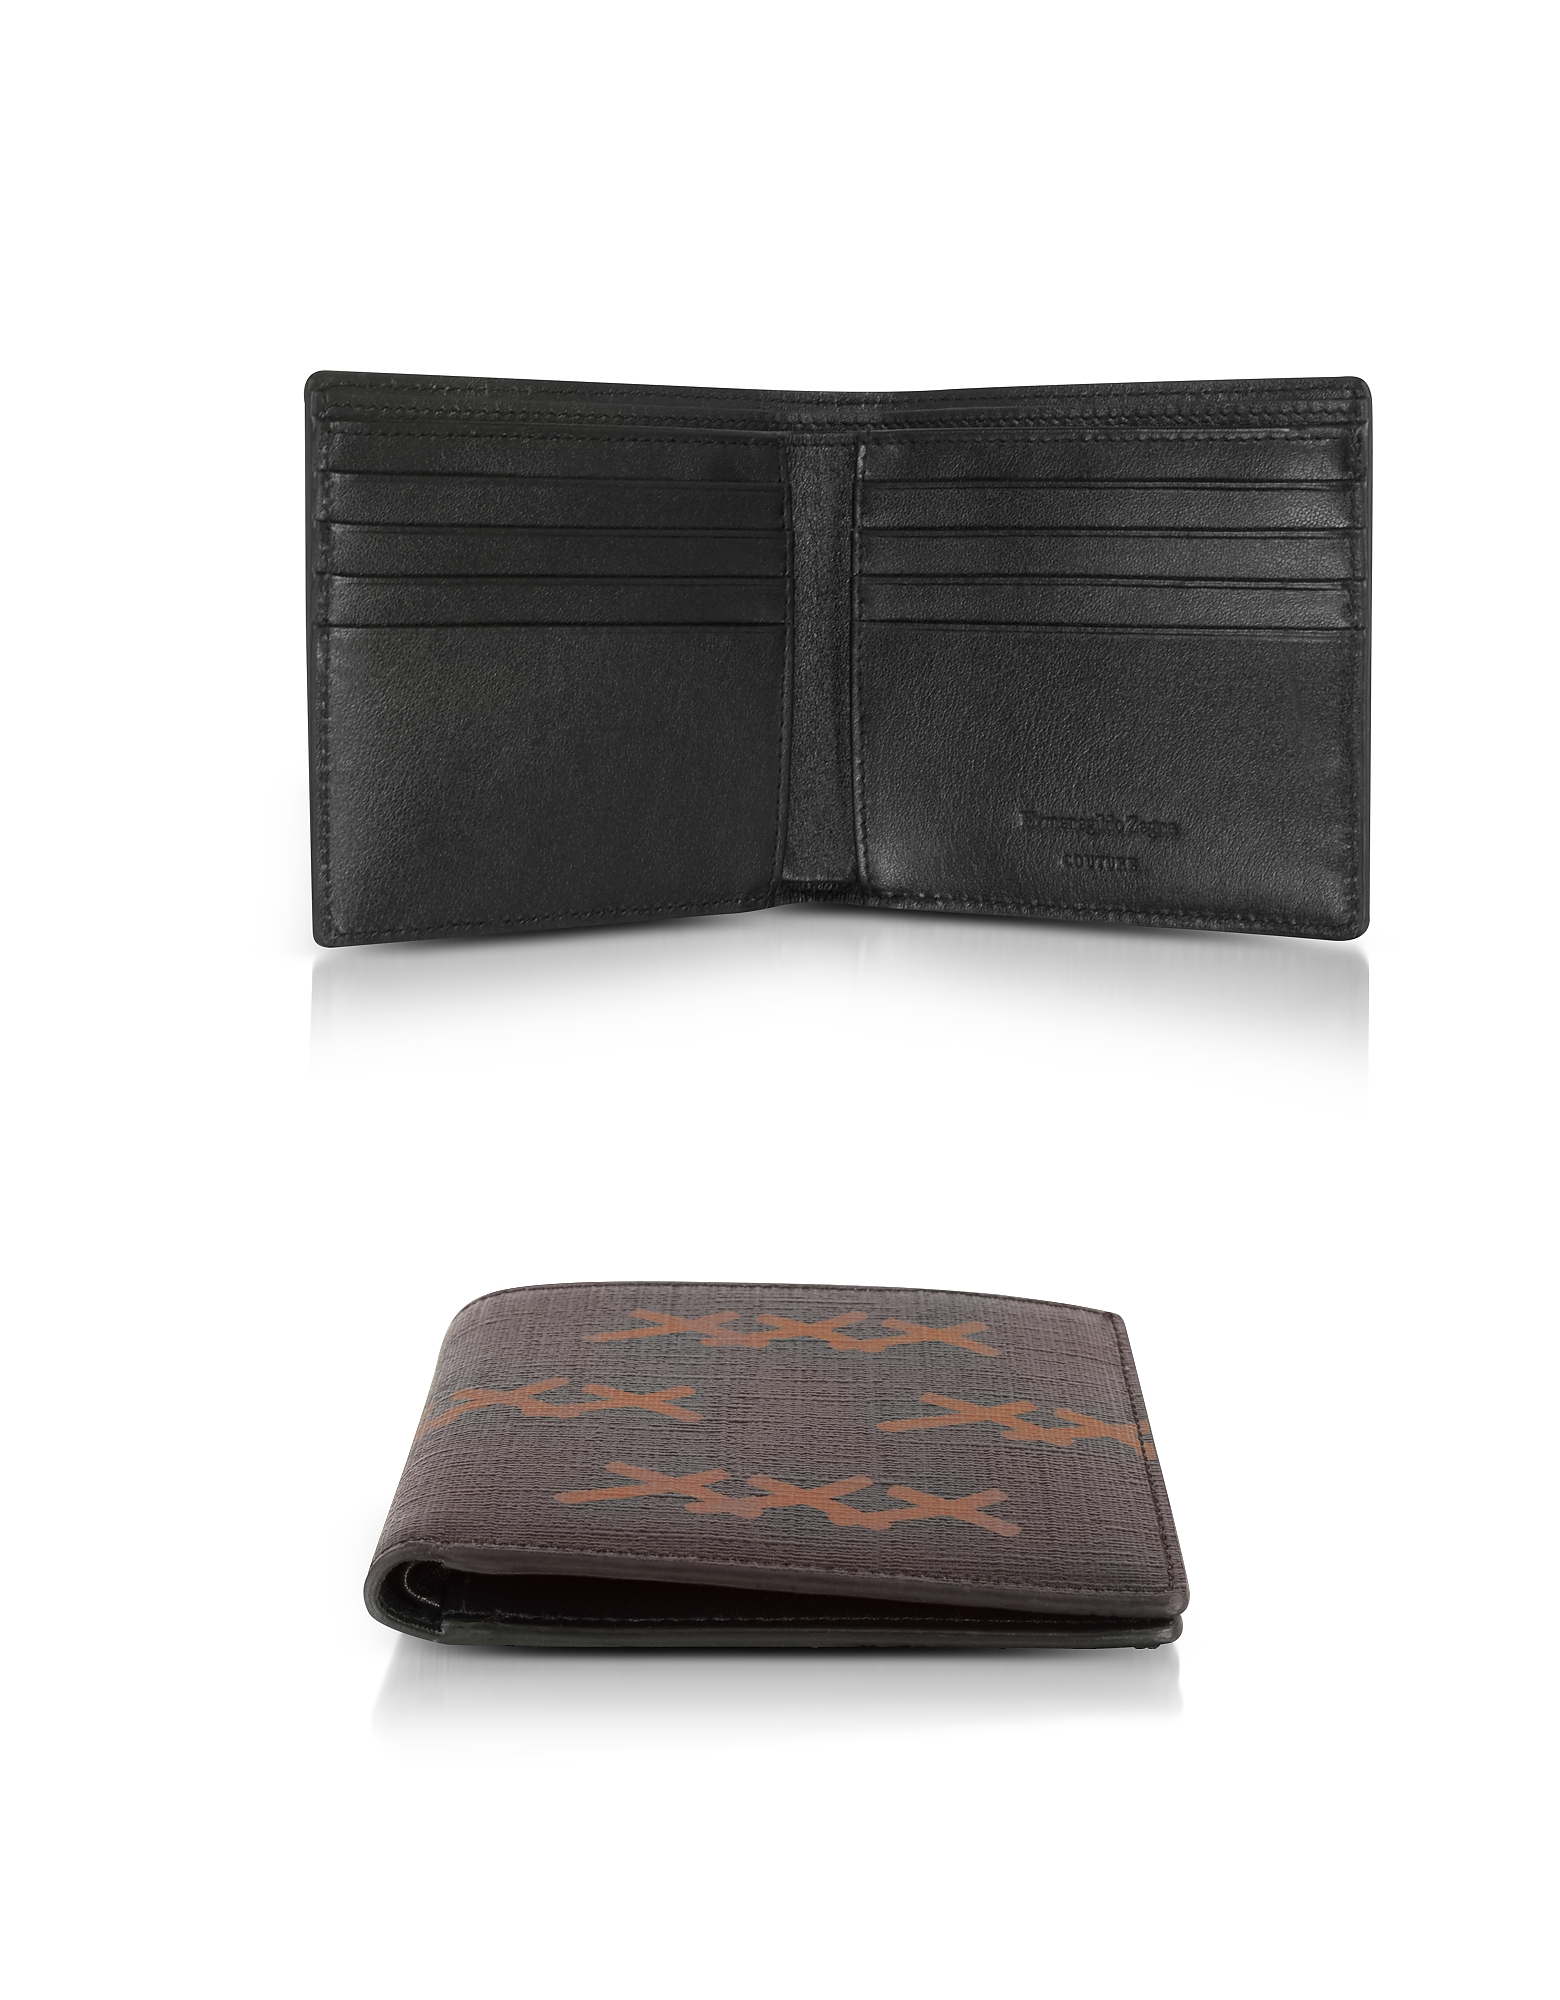 Image of Ermenegildo Zegna Designer Wallets, XXX Printed Canvas and Leather Billfold Wallet